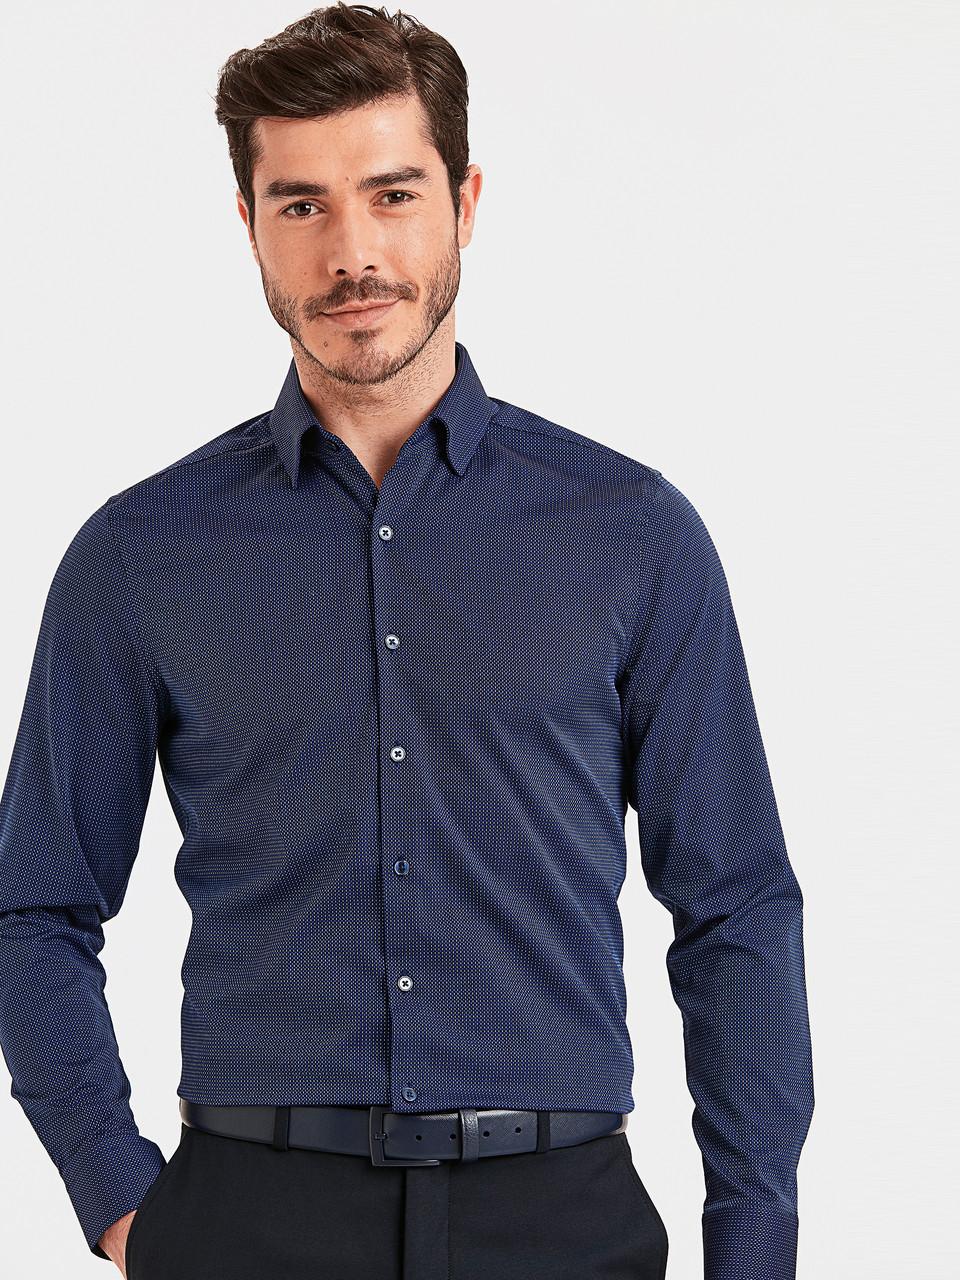 Синяя мужская рубашка LC Waikiki / ЛС Вайкики в тонкий голубой принт